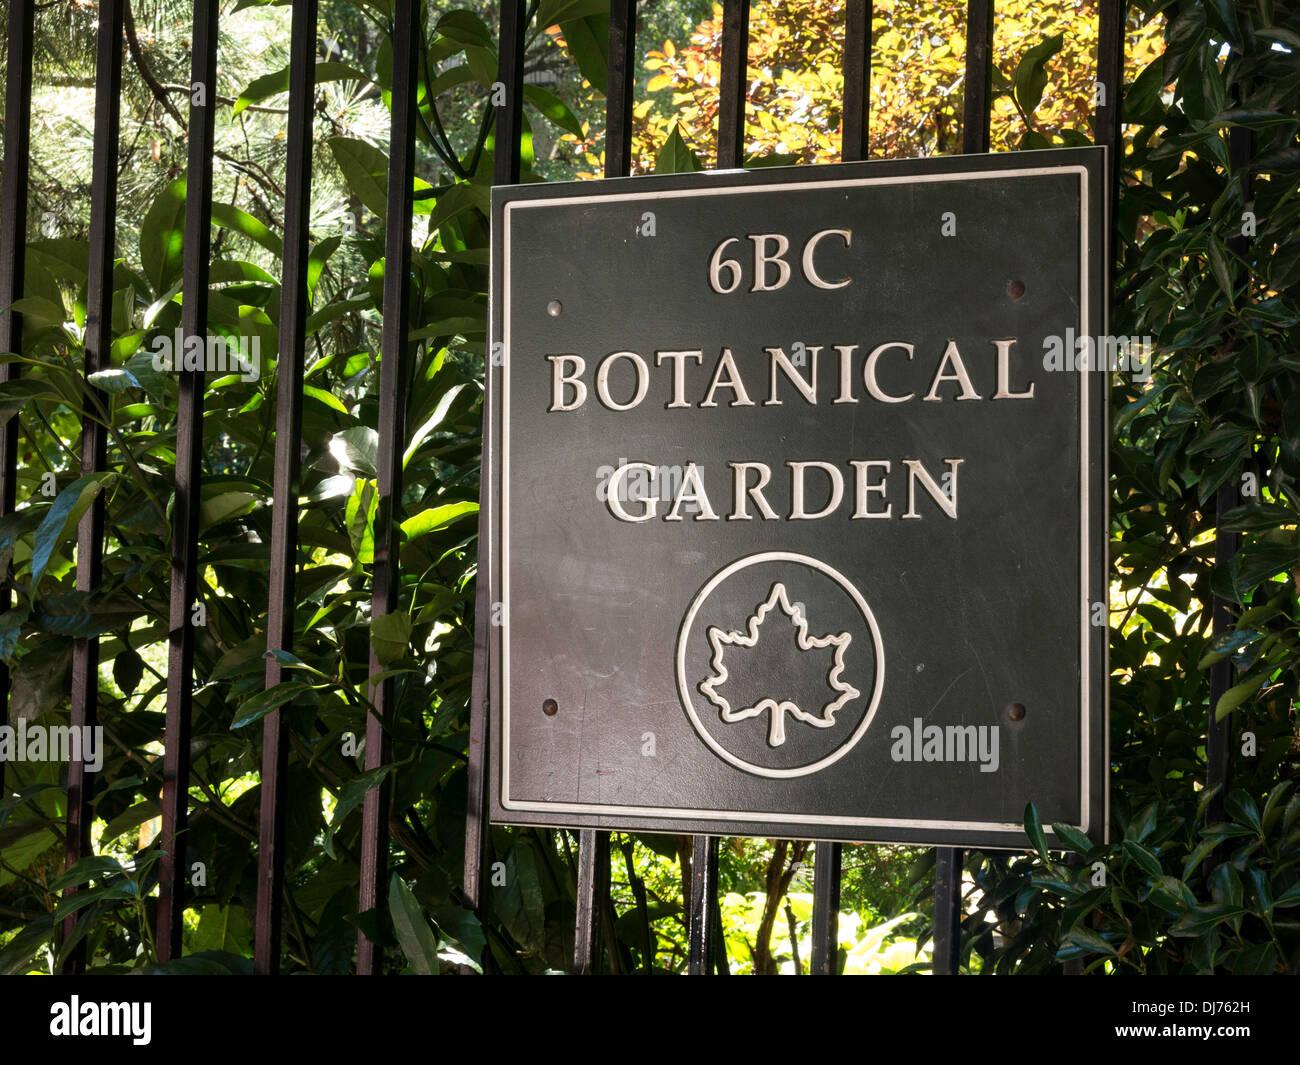 6BC Botanical Garden Sign, NYC